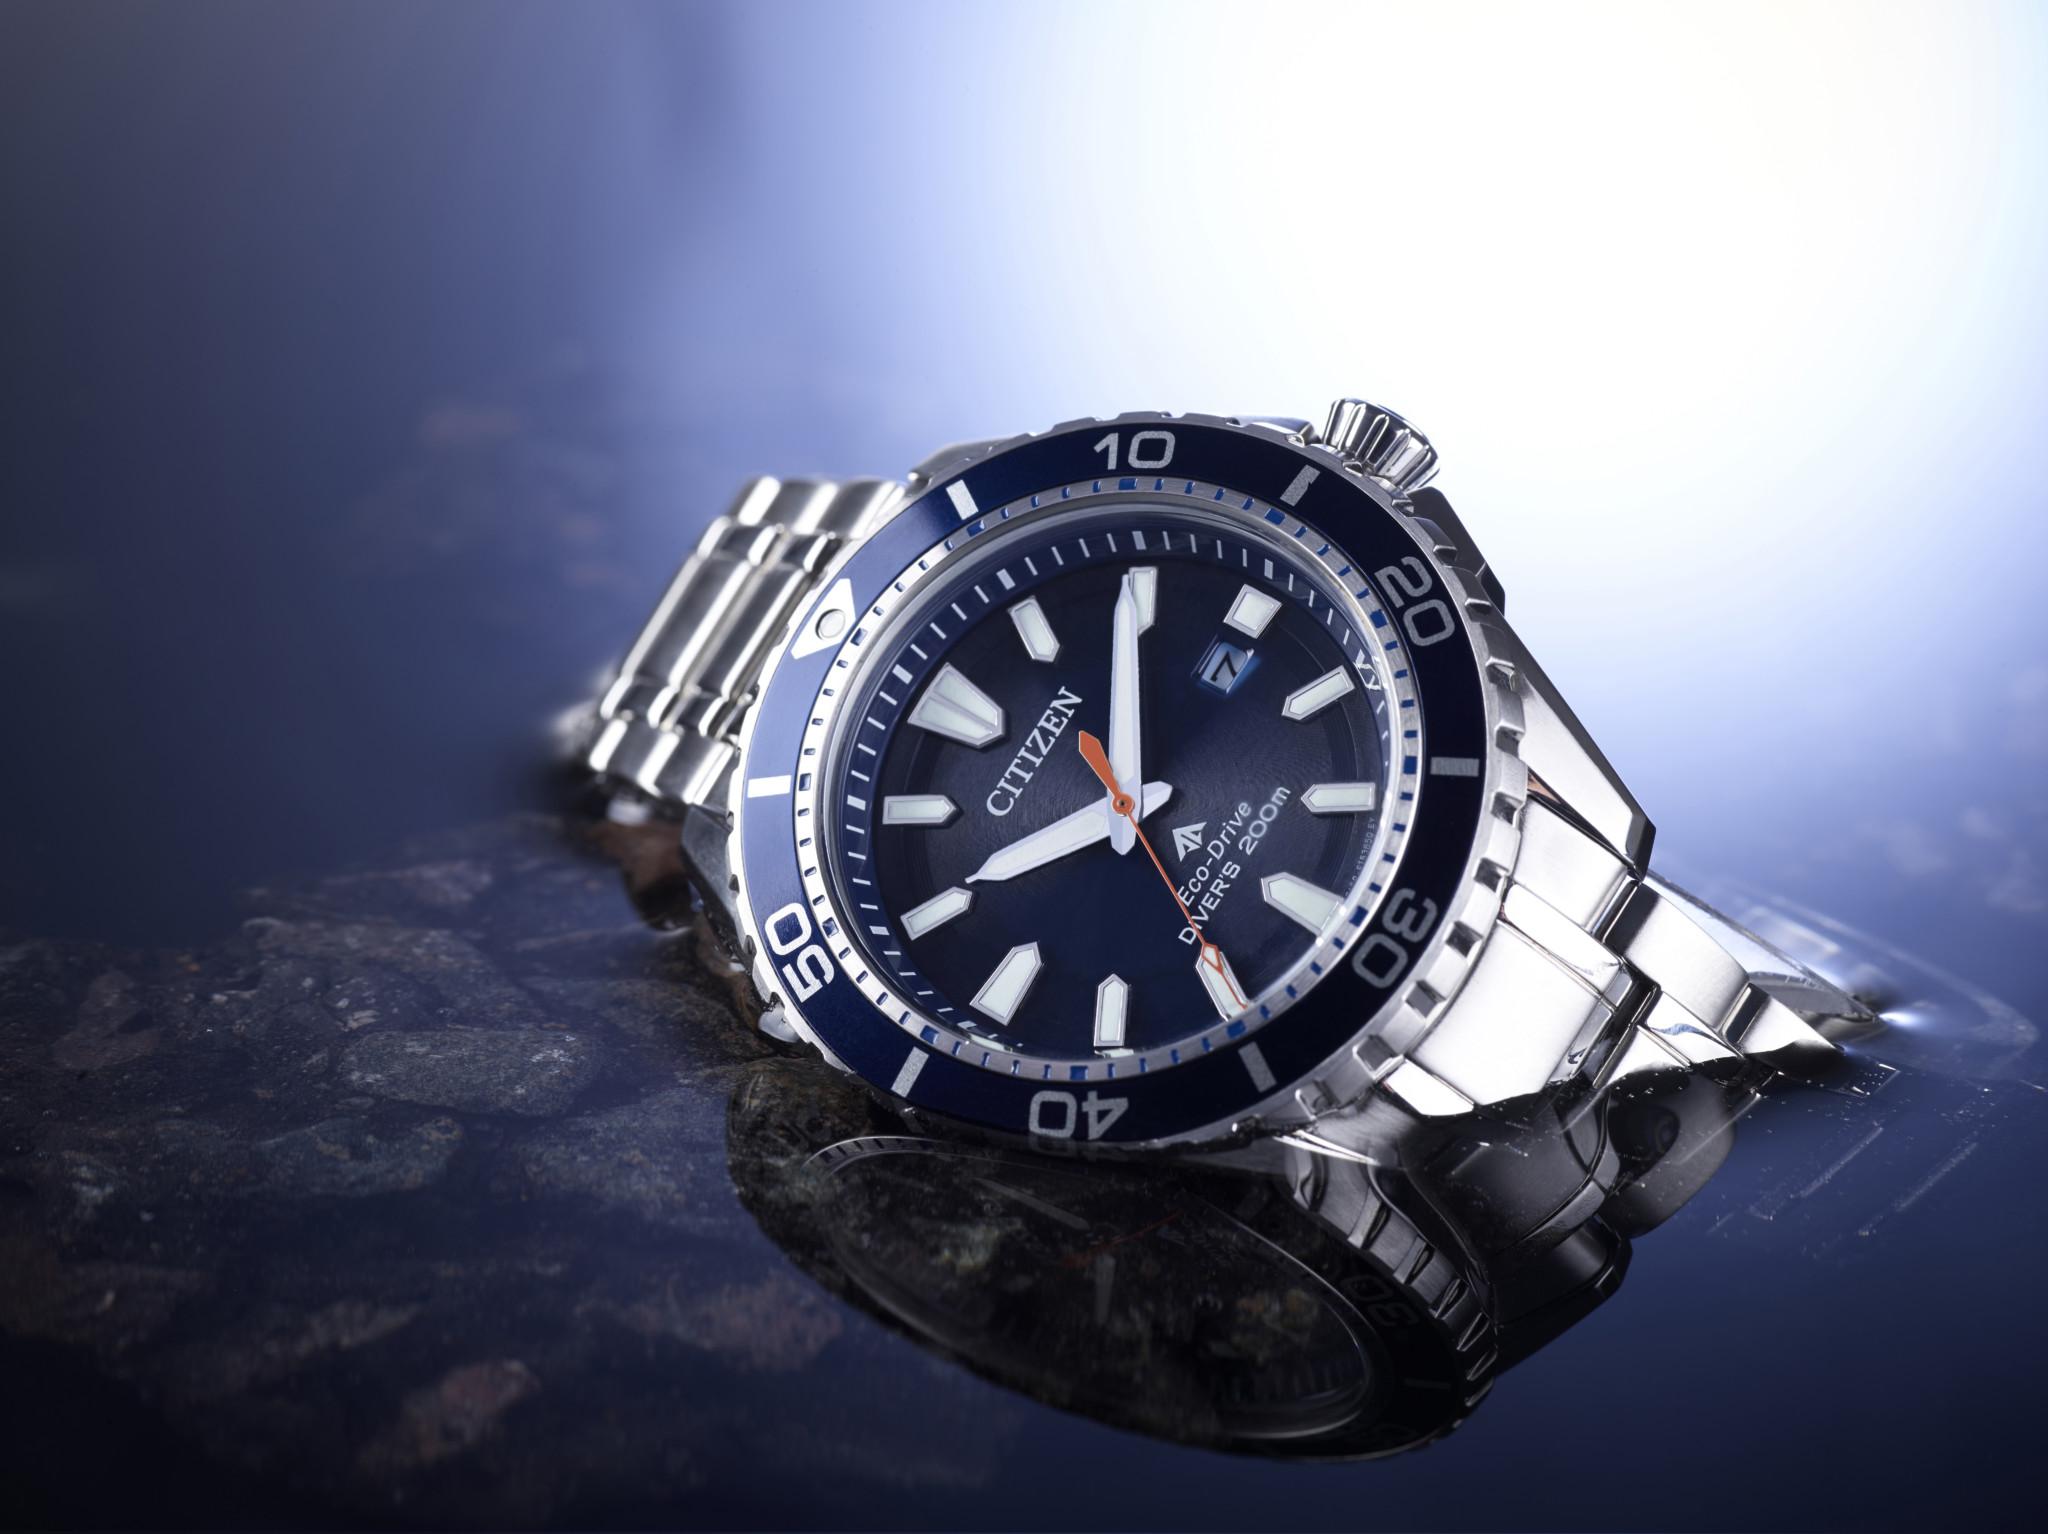 Promaster Diver -BN0191-55L Lifestyle